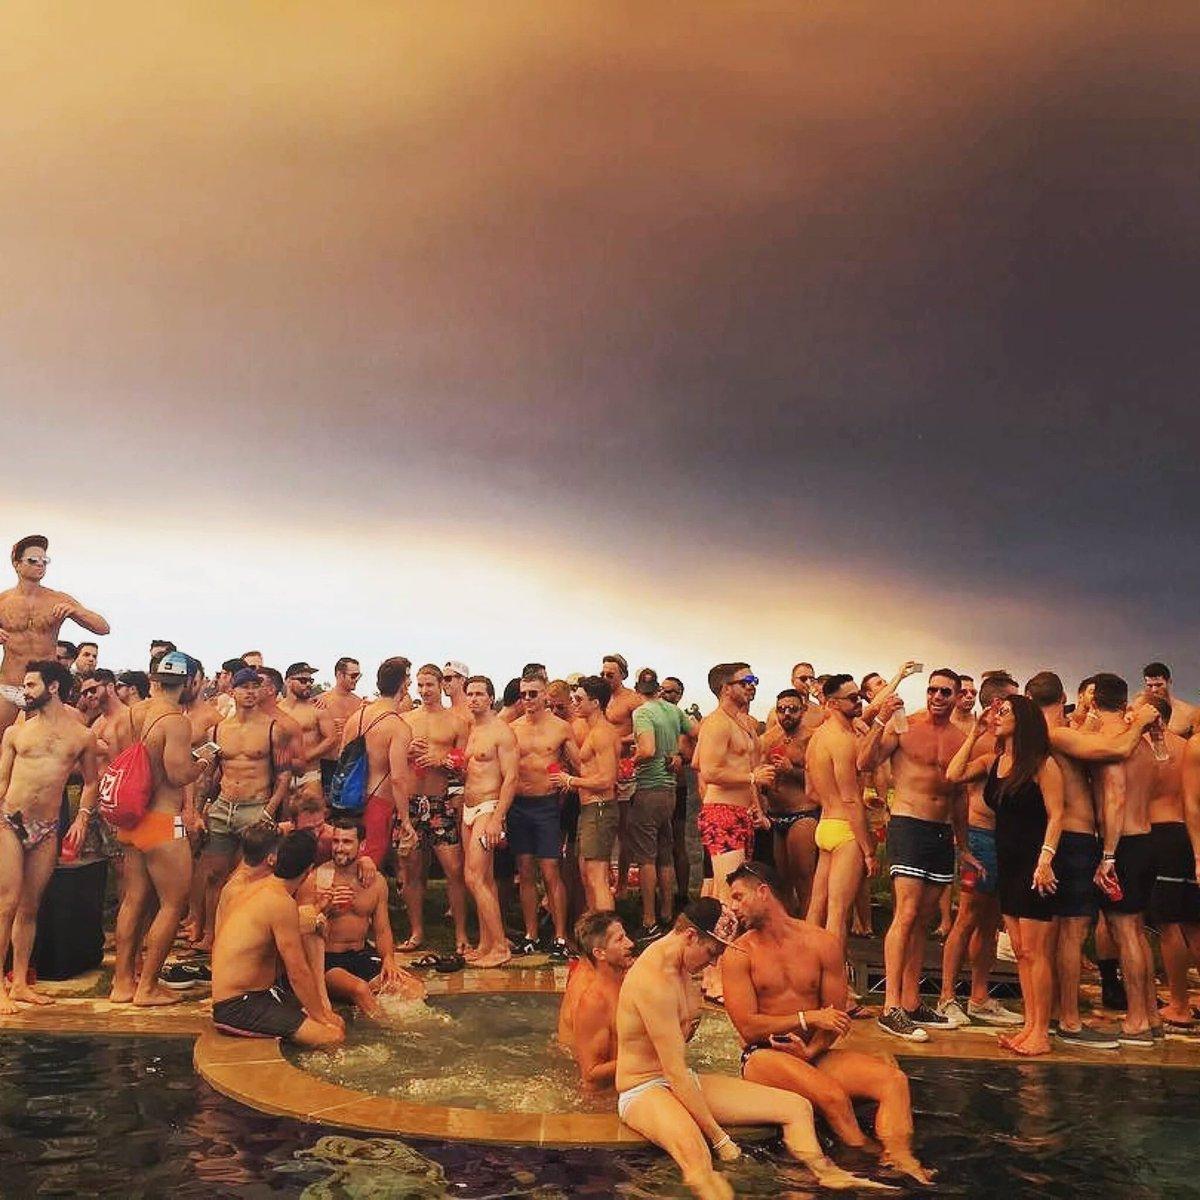 #Apocalyptic scenes produced by 20k acre #SandFire. Pics @designgeorge24 @Rob_Hoffman @thebenbergman @KatelynMichele https://t.co/lBdXosNY0q